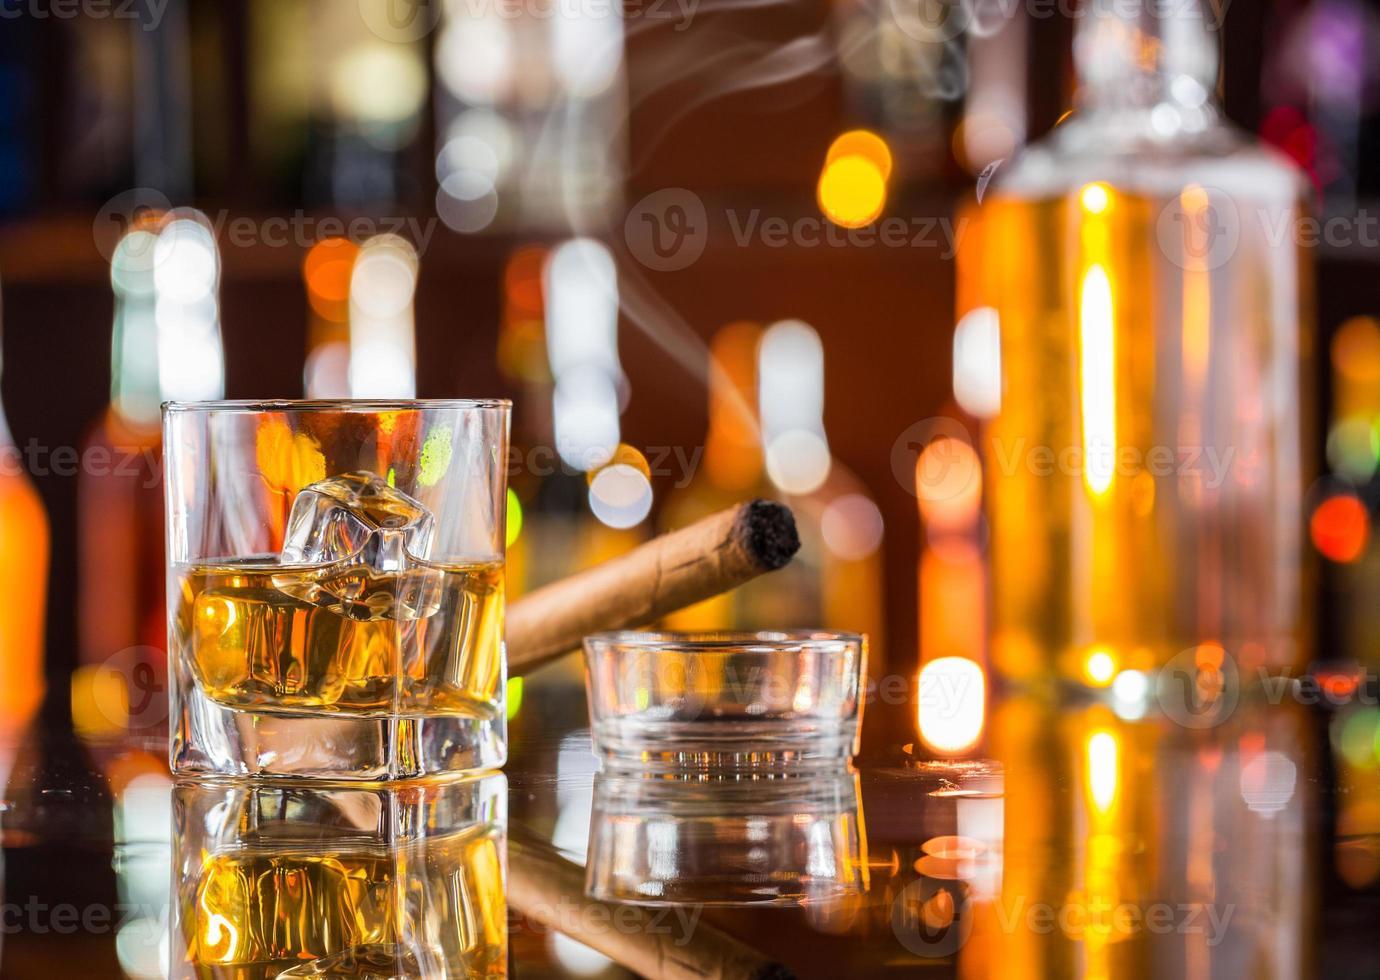 Boisson au whisky avec cigare fumant au bar photo